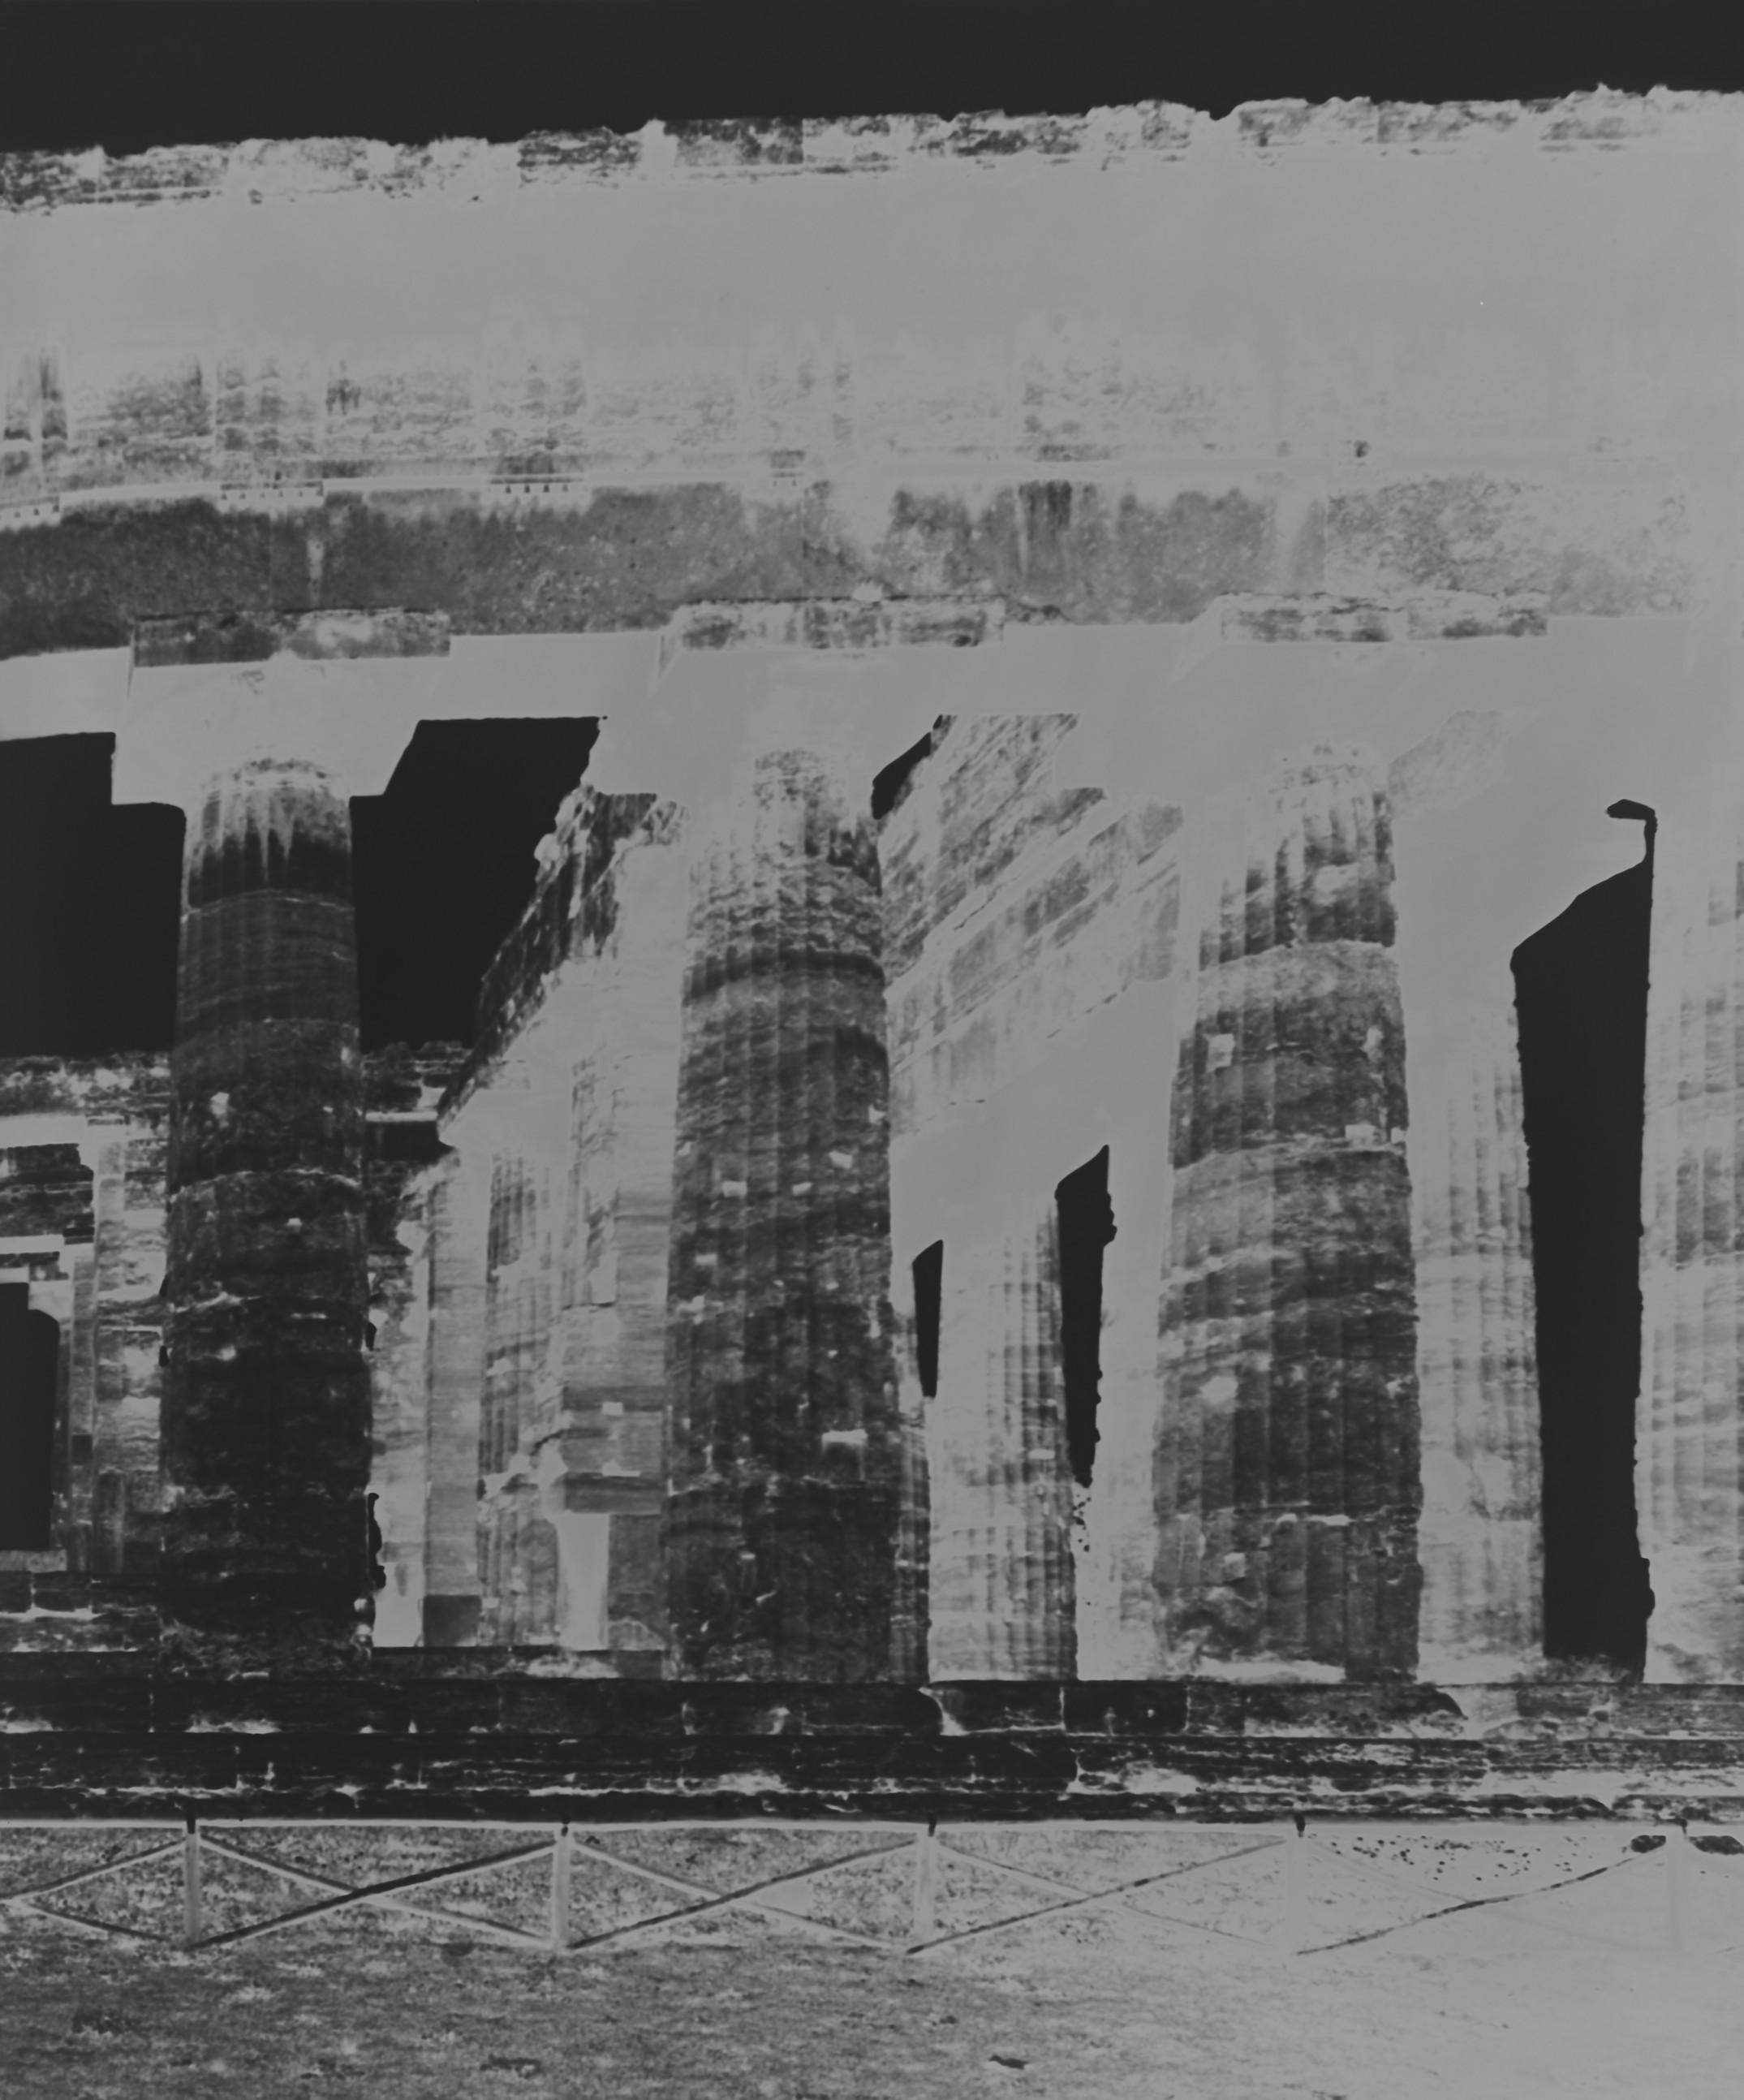 Temple of Nettuno, Paestum: October 23, 2015